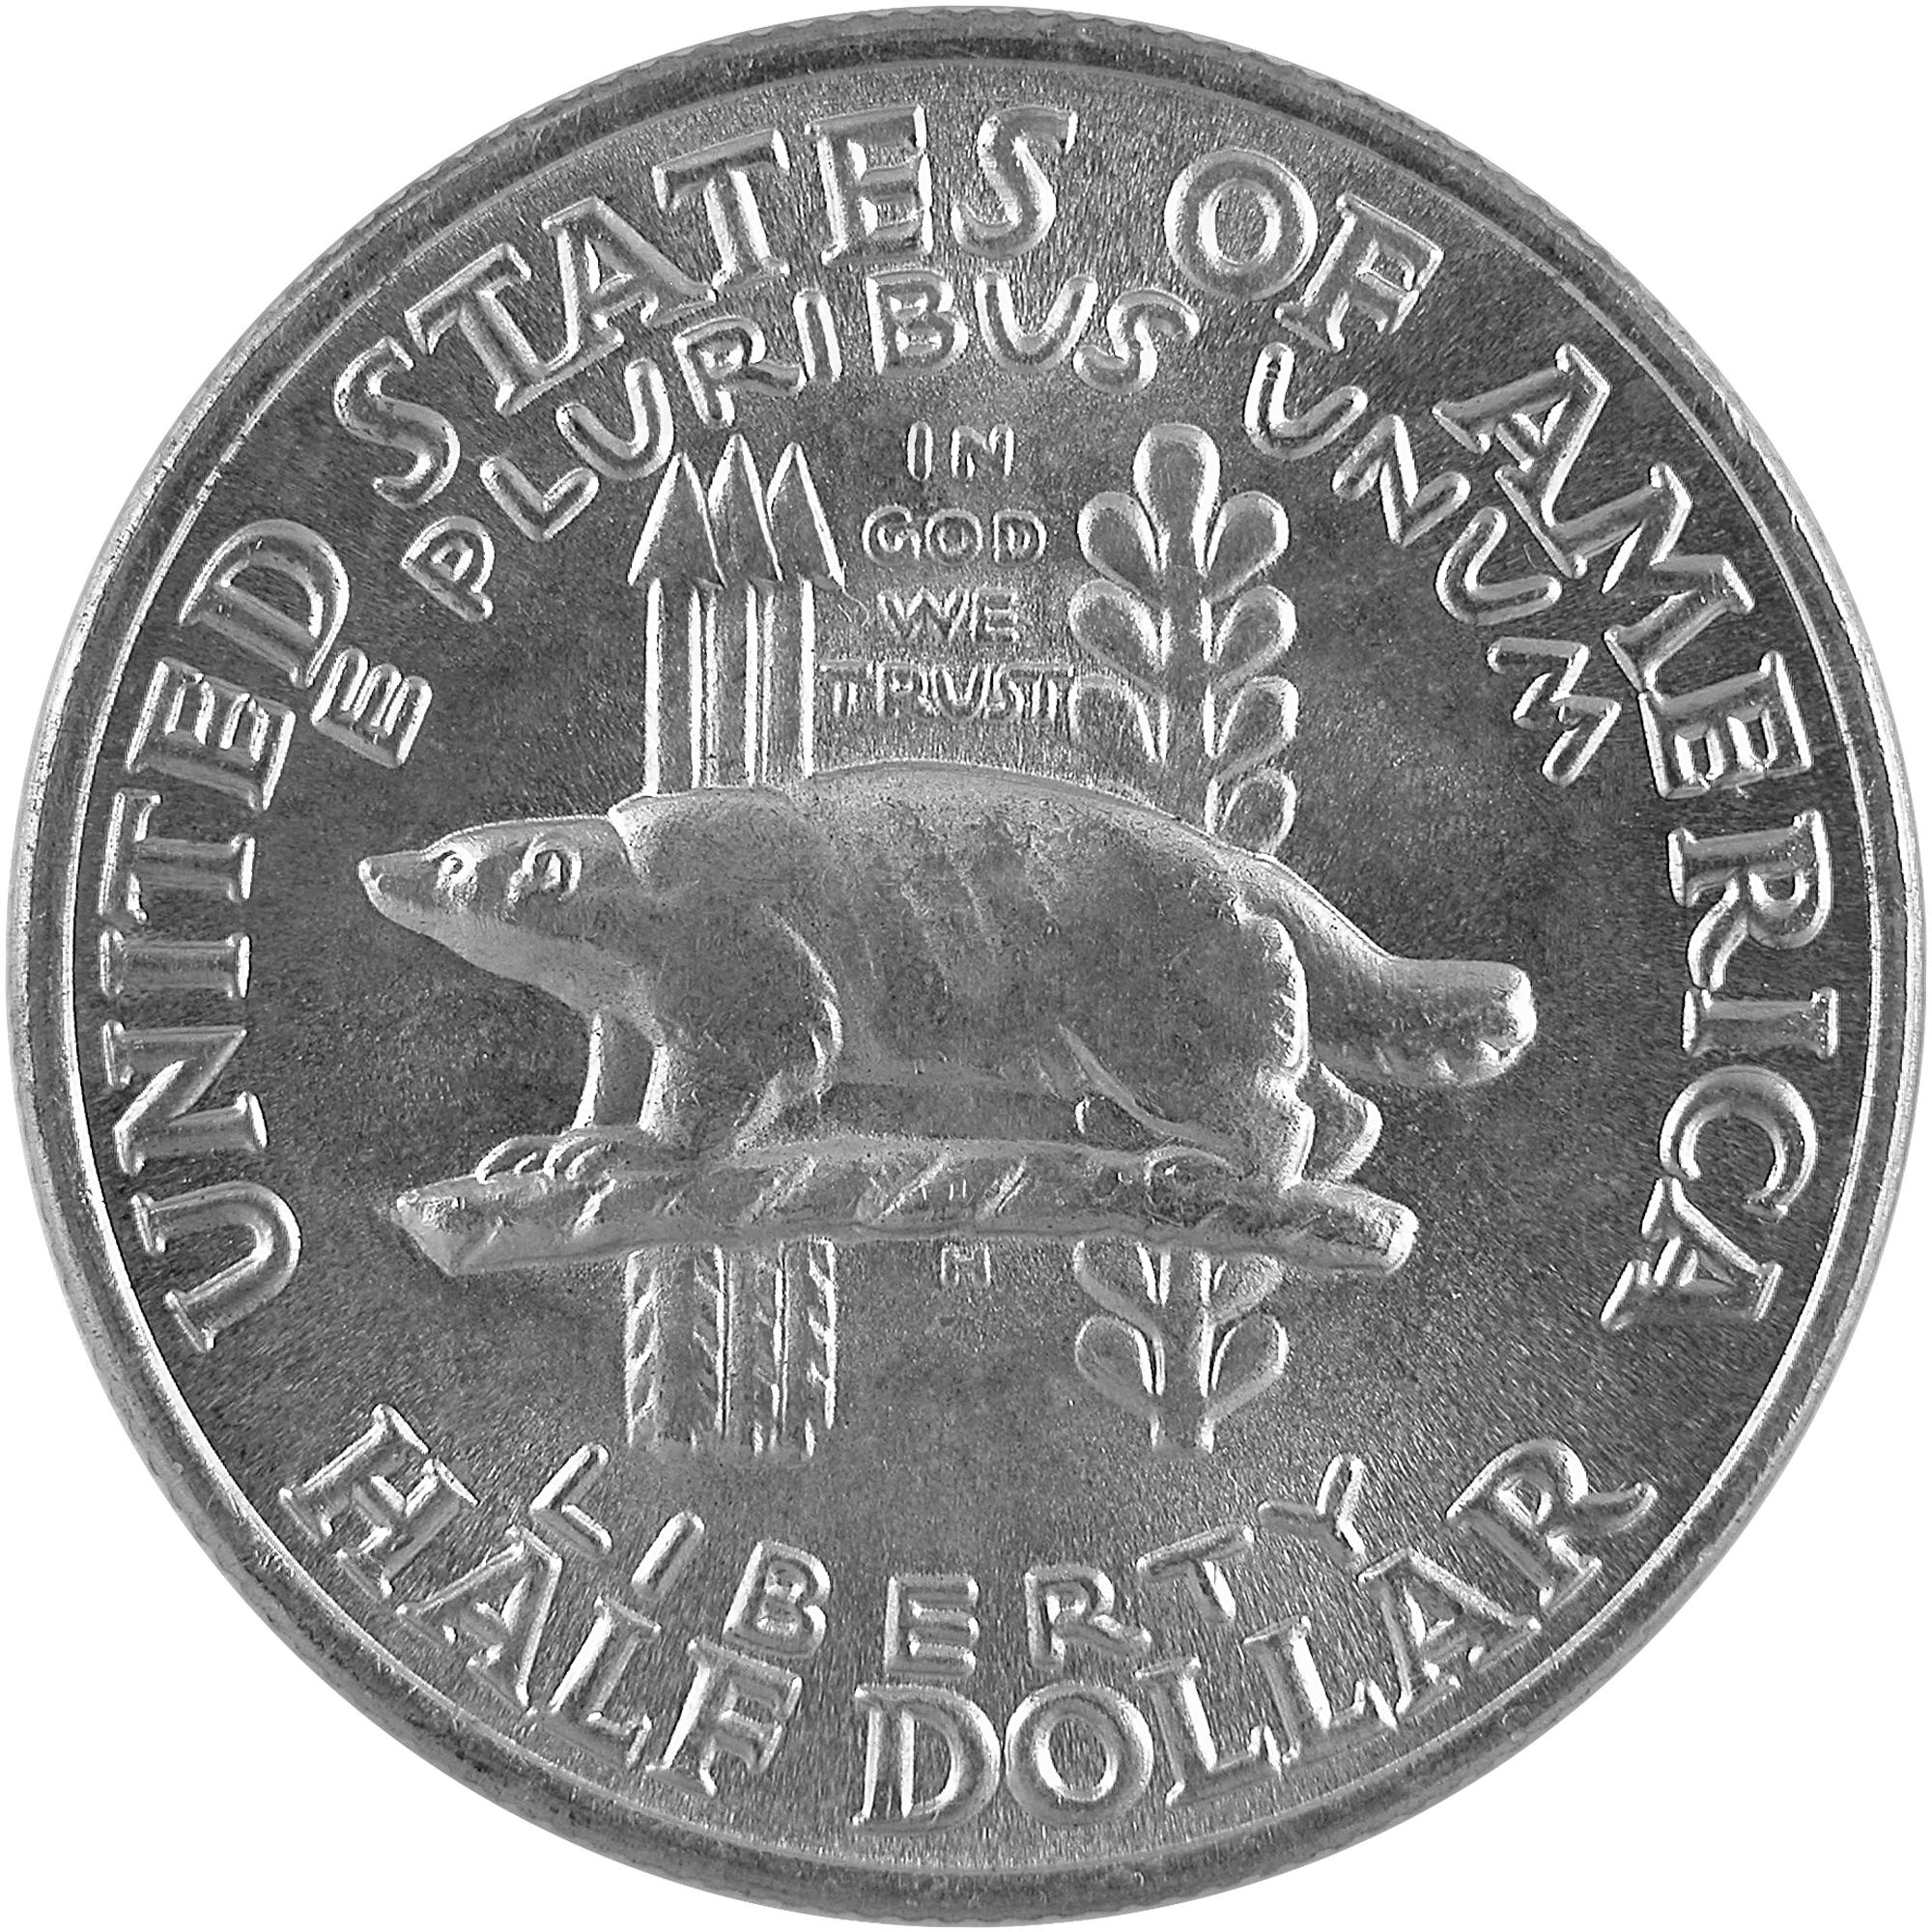 1936 Wisconsin Territory Centennial Commemorative Silver Half Dollar Coin Obverse